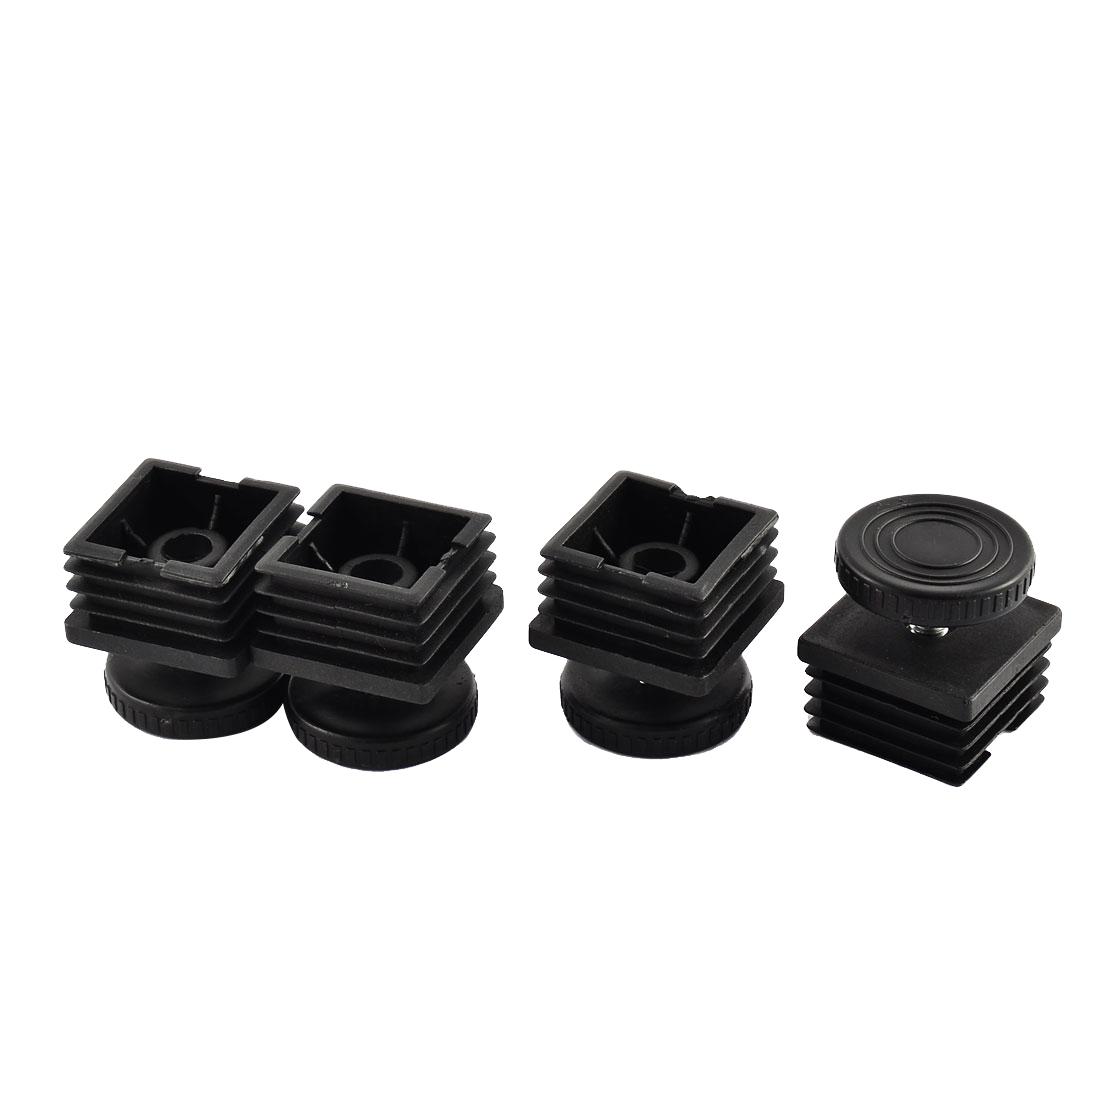 4 Sets Furniture Leg Adjustable Leveling Foot 38mm x 38mm Square Tube Insert Kit